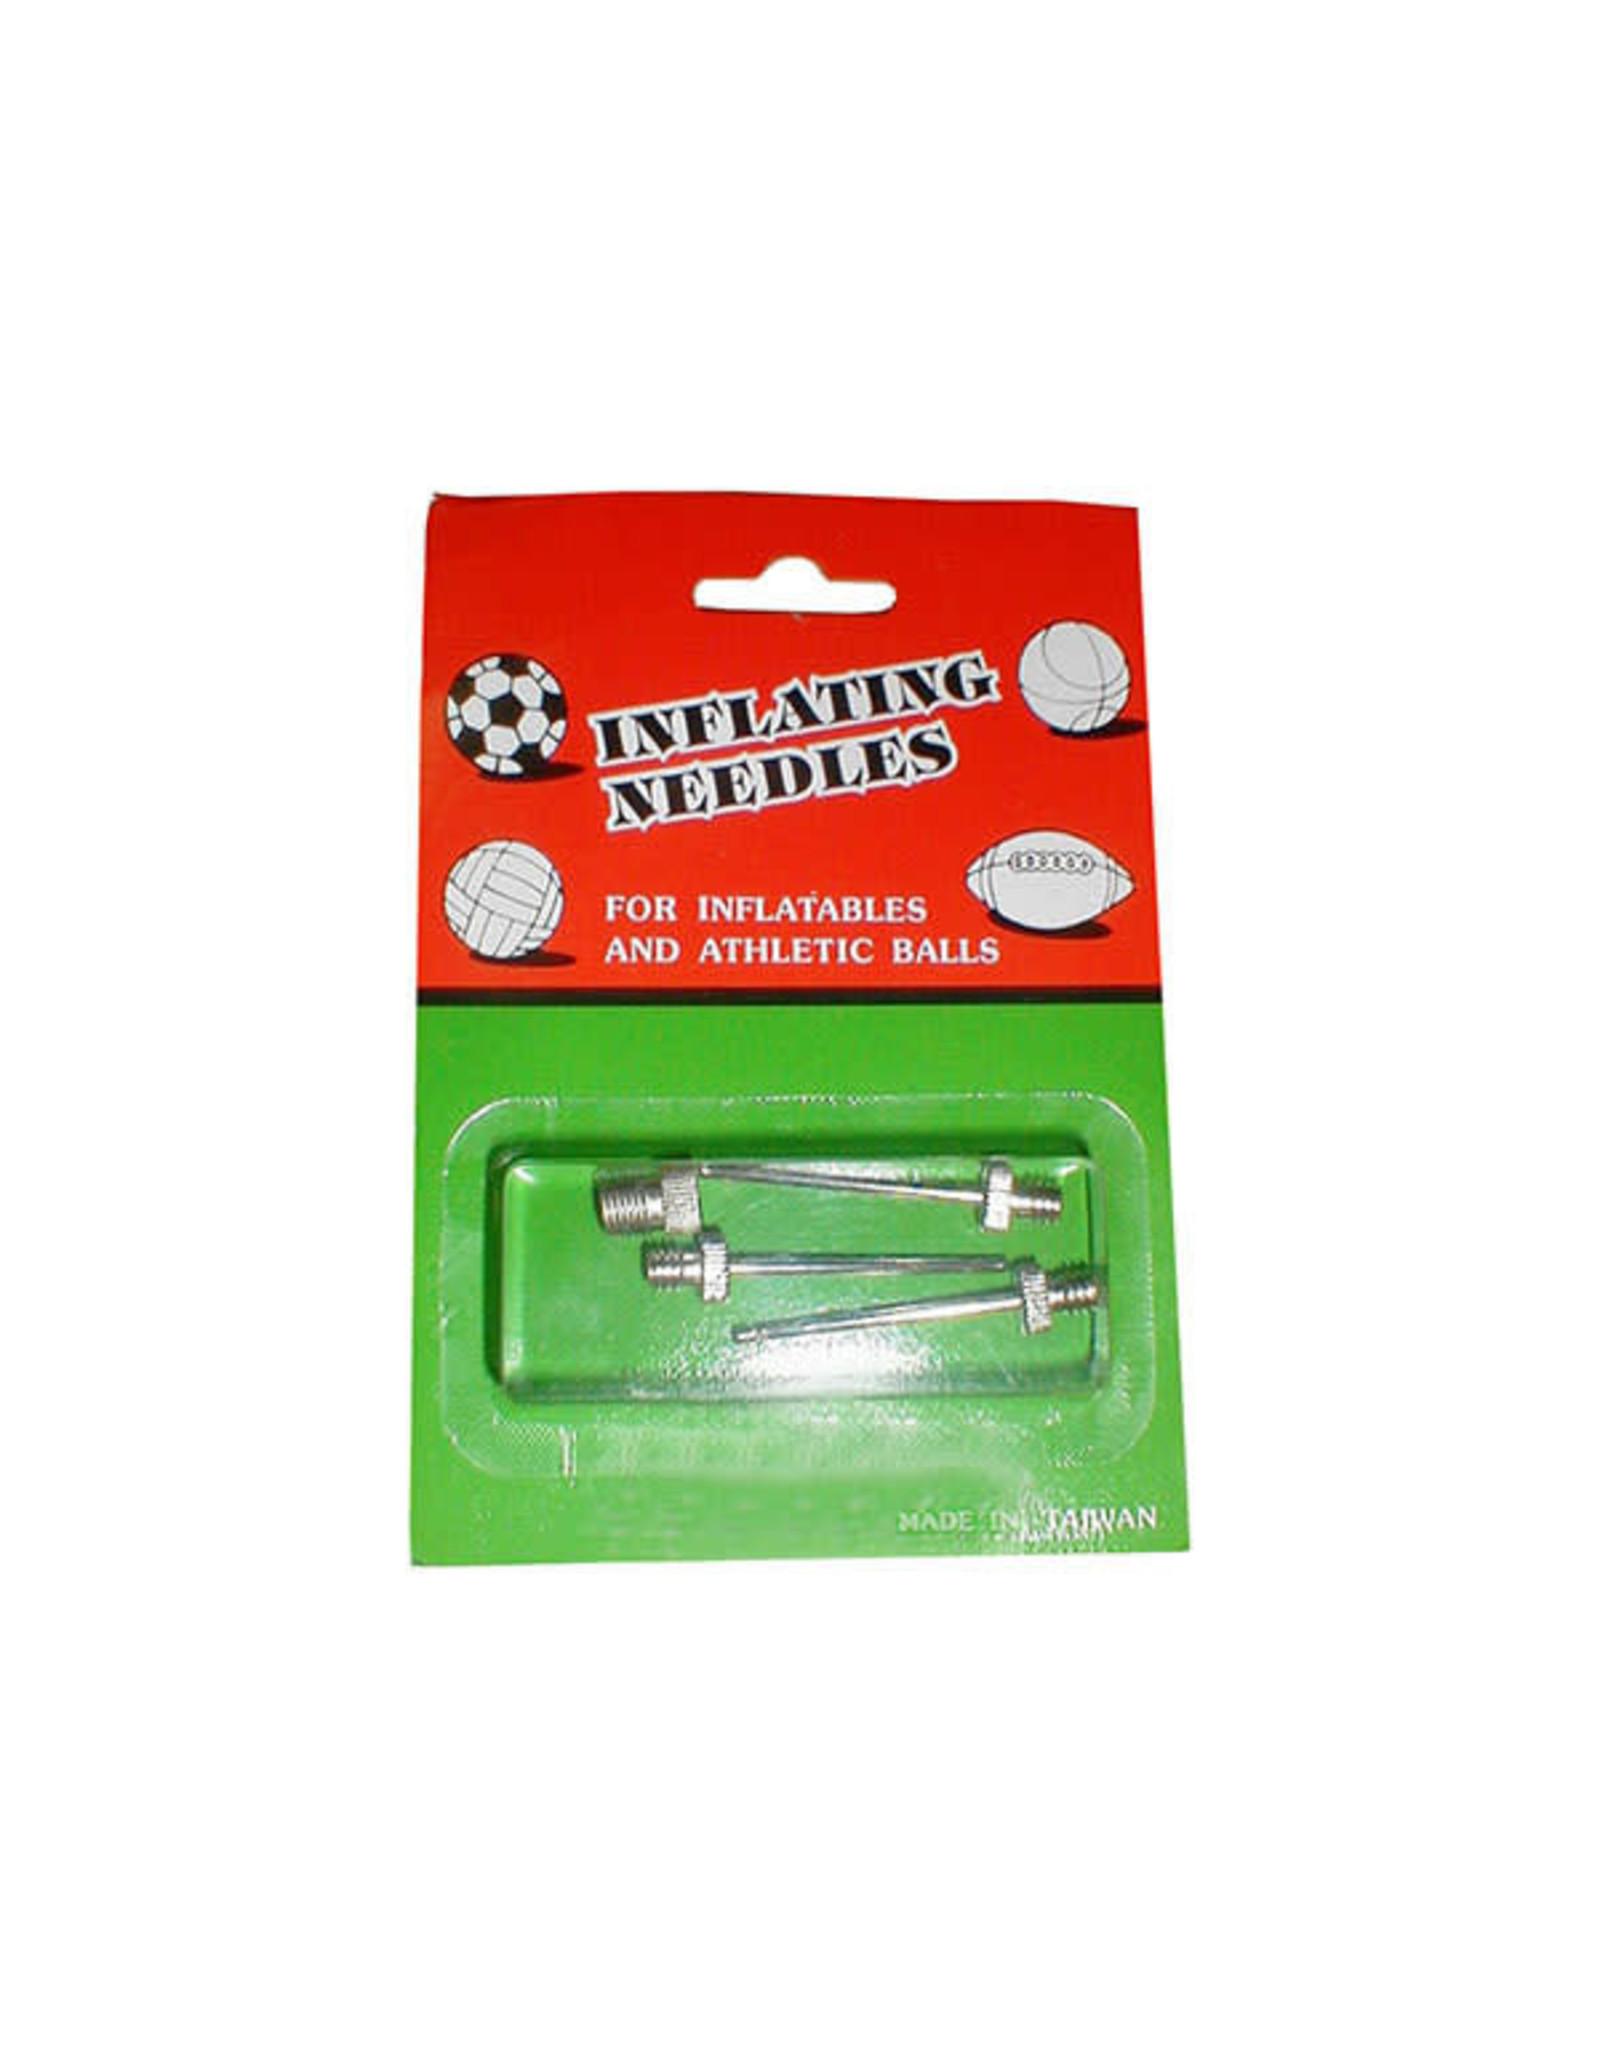 Avanti Inflating Needles (3 Pieces)